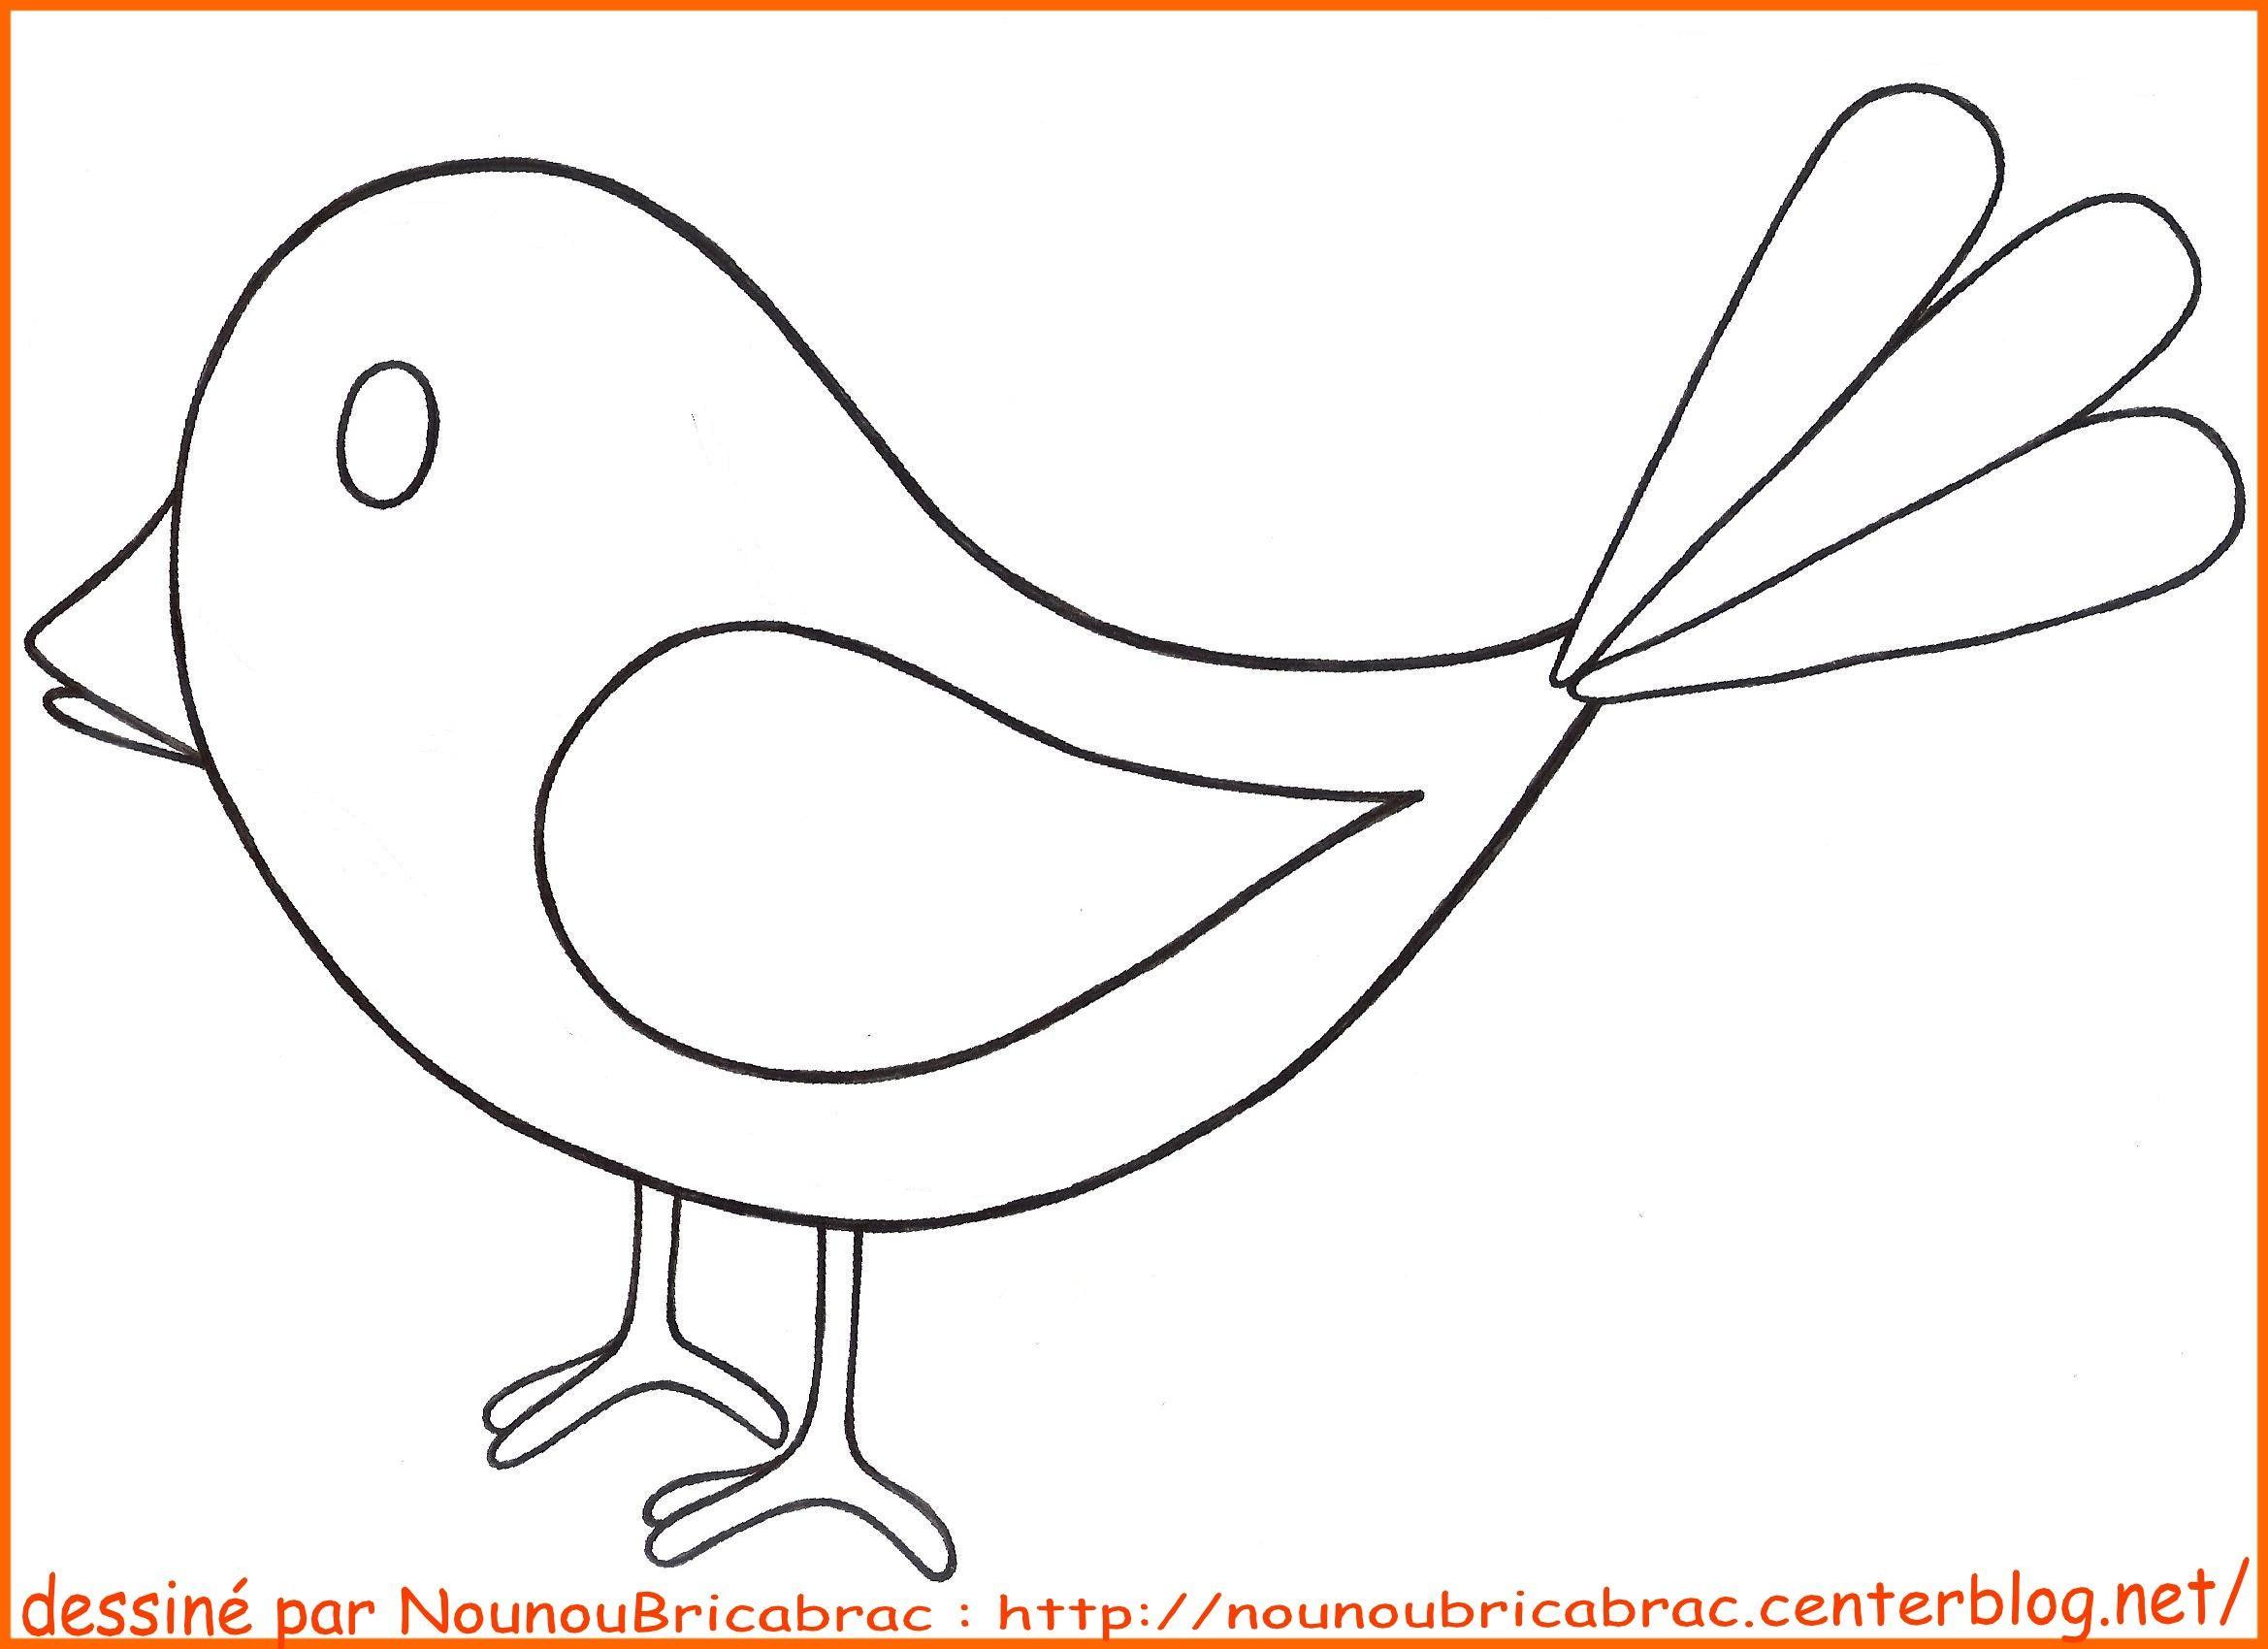 Dessin Facile Oiseau Picture | Oiseau Coloriage, Coloriage serapportantà Image Facile A Reproduire